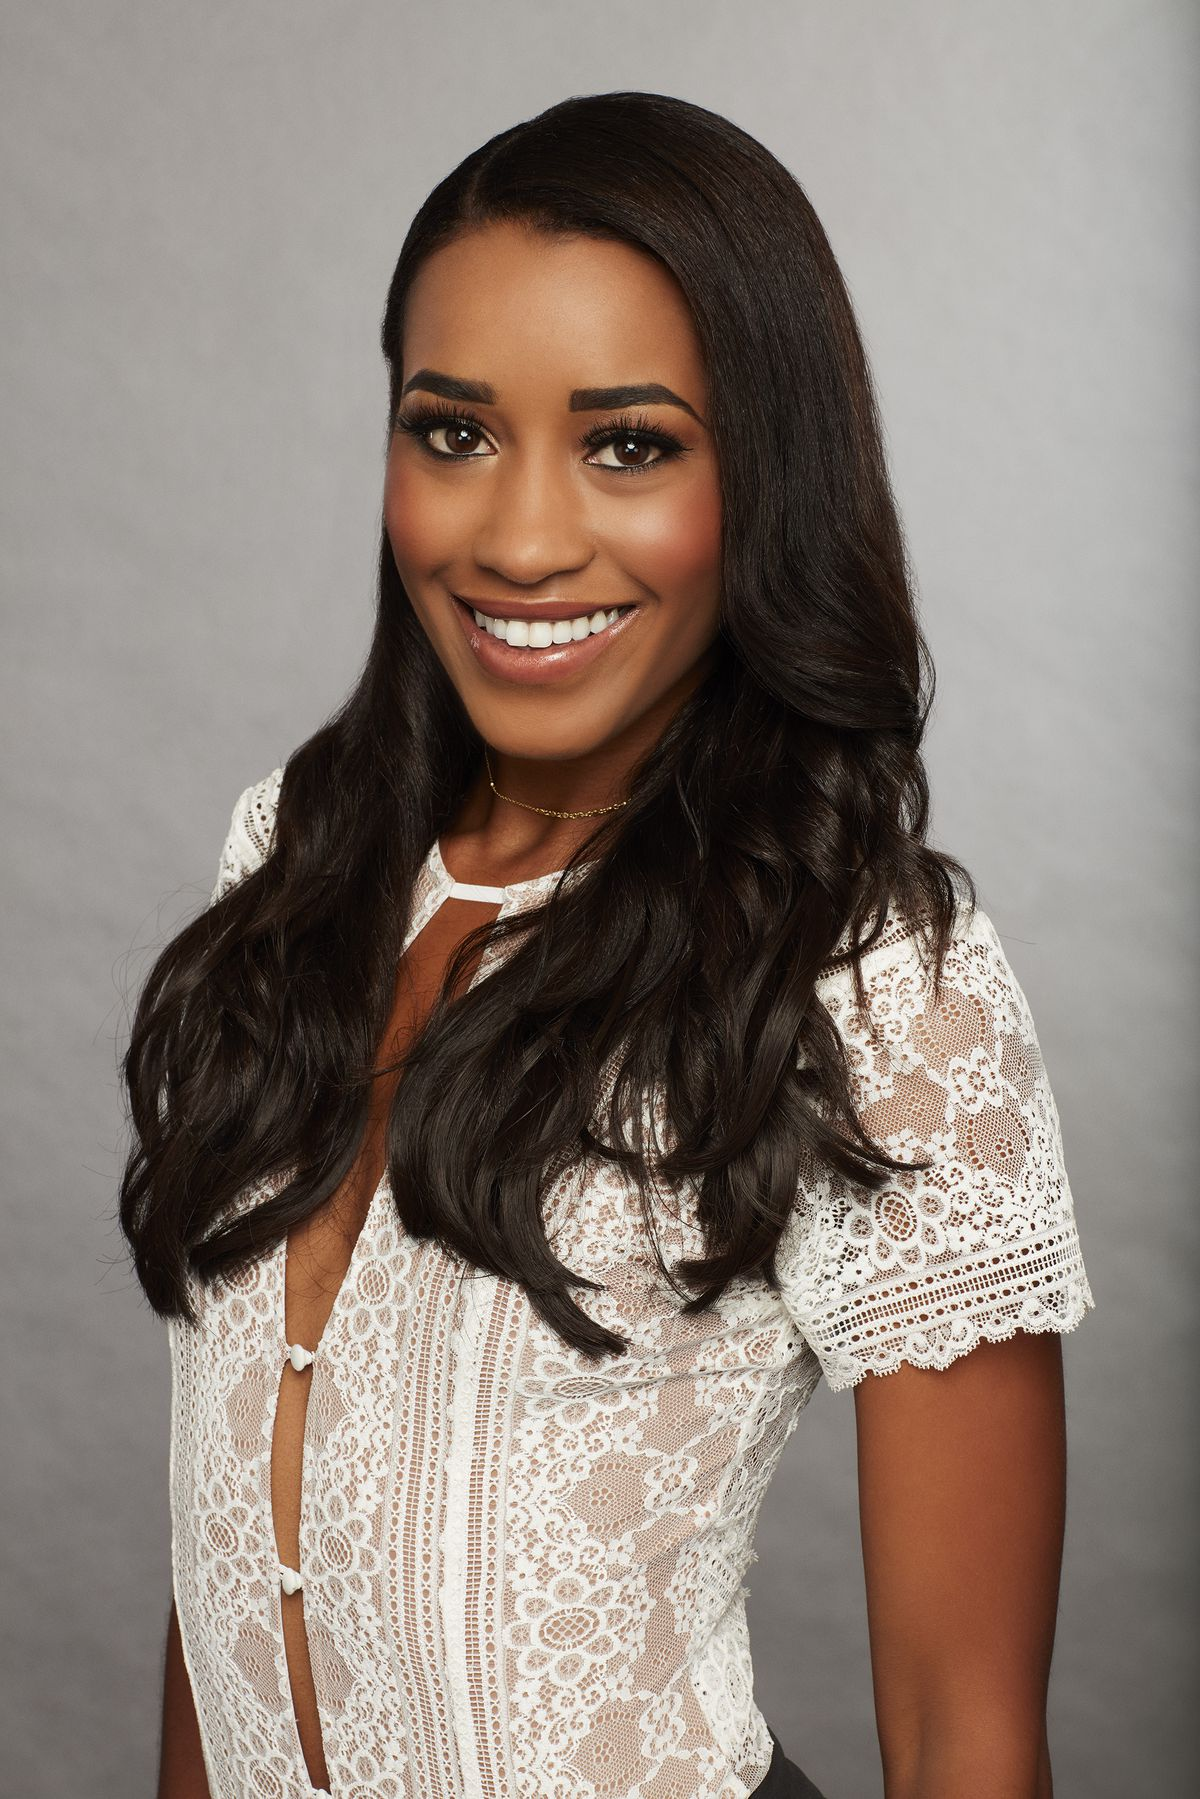 Bachelor contestant Seinne, 27